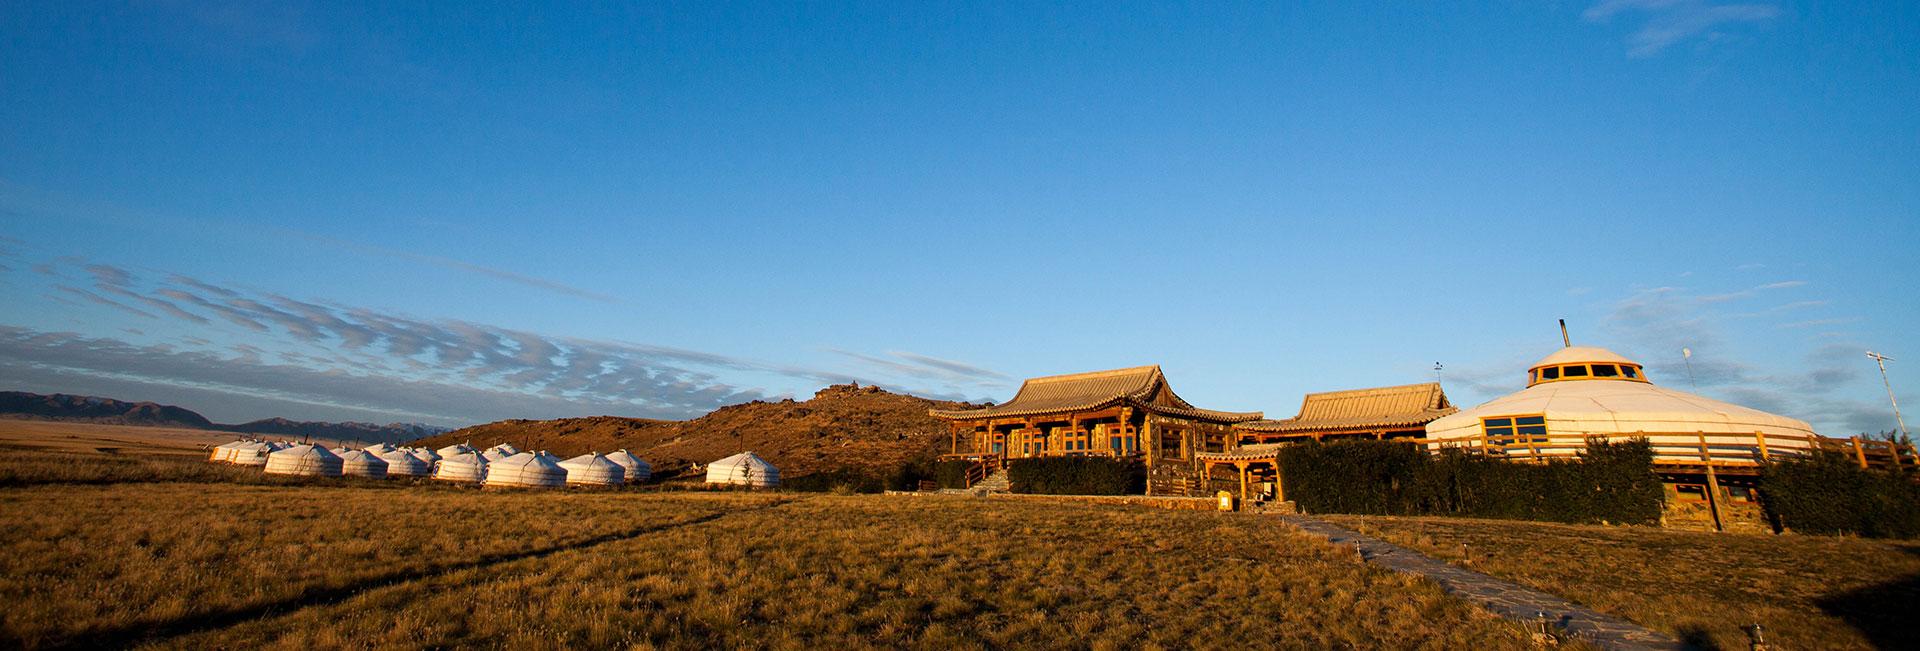 Three Camel Lodge, Mongolia.